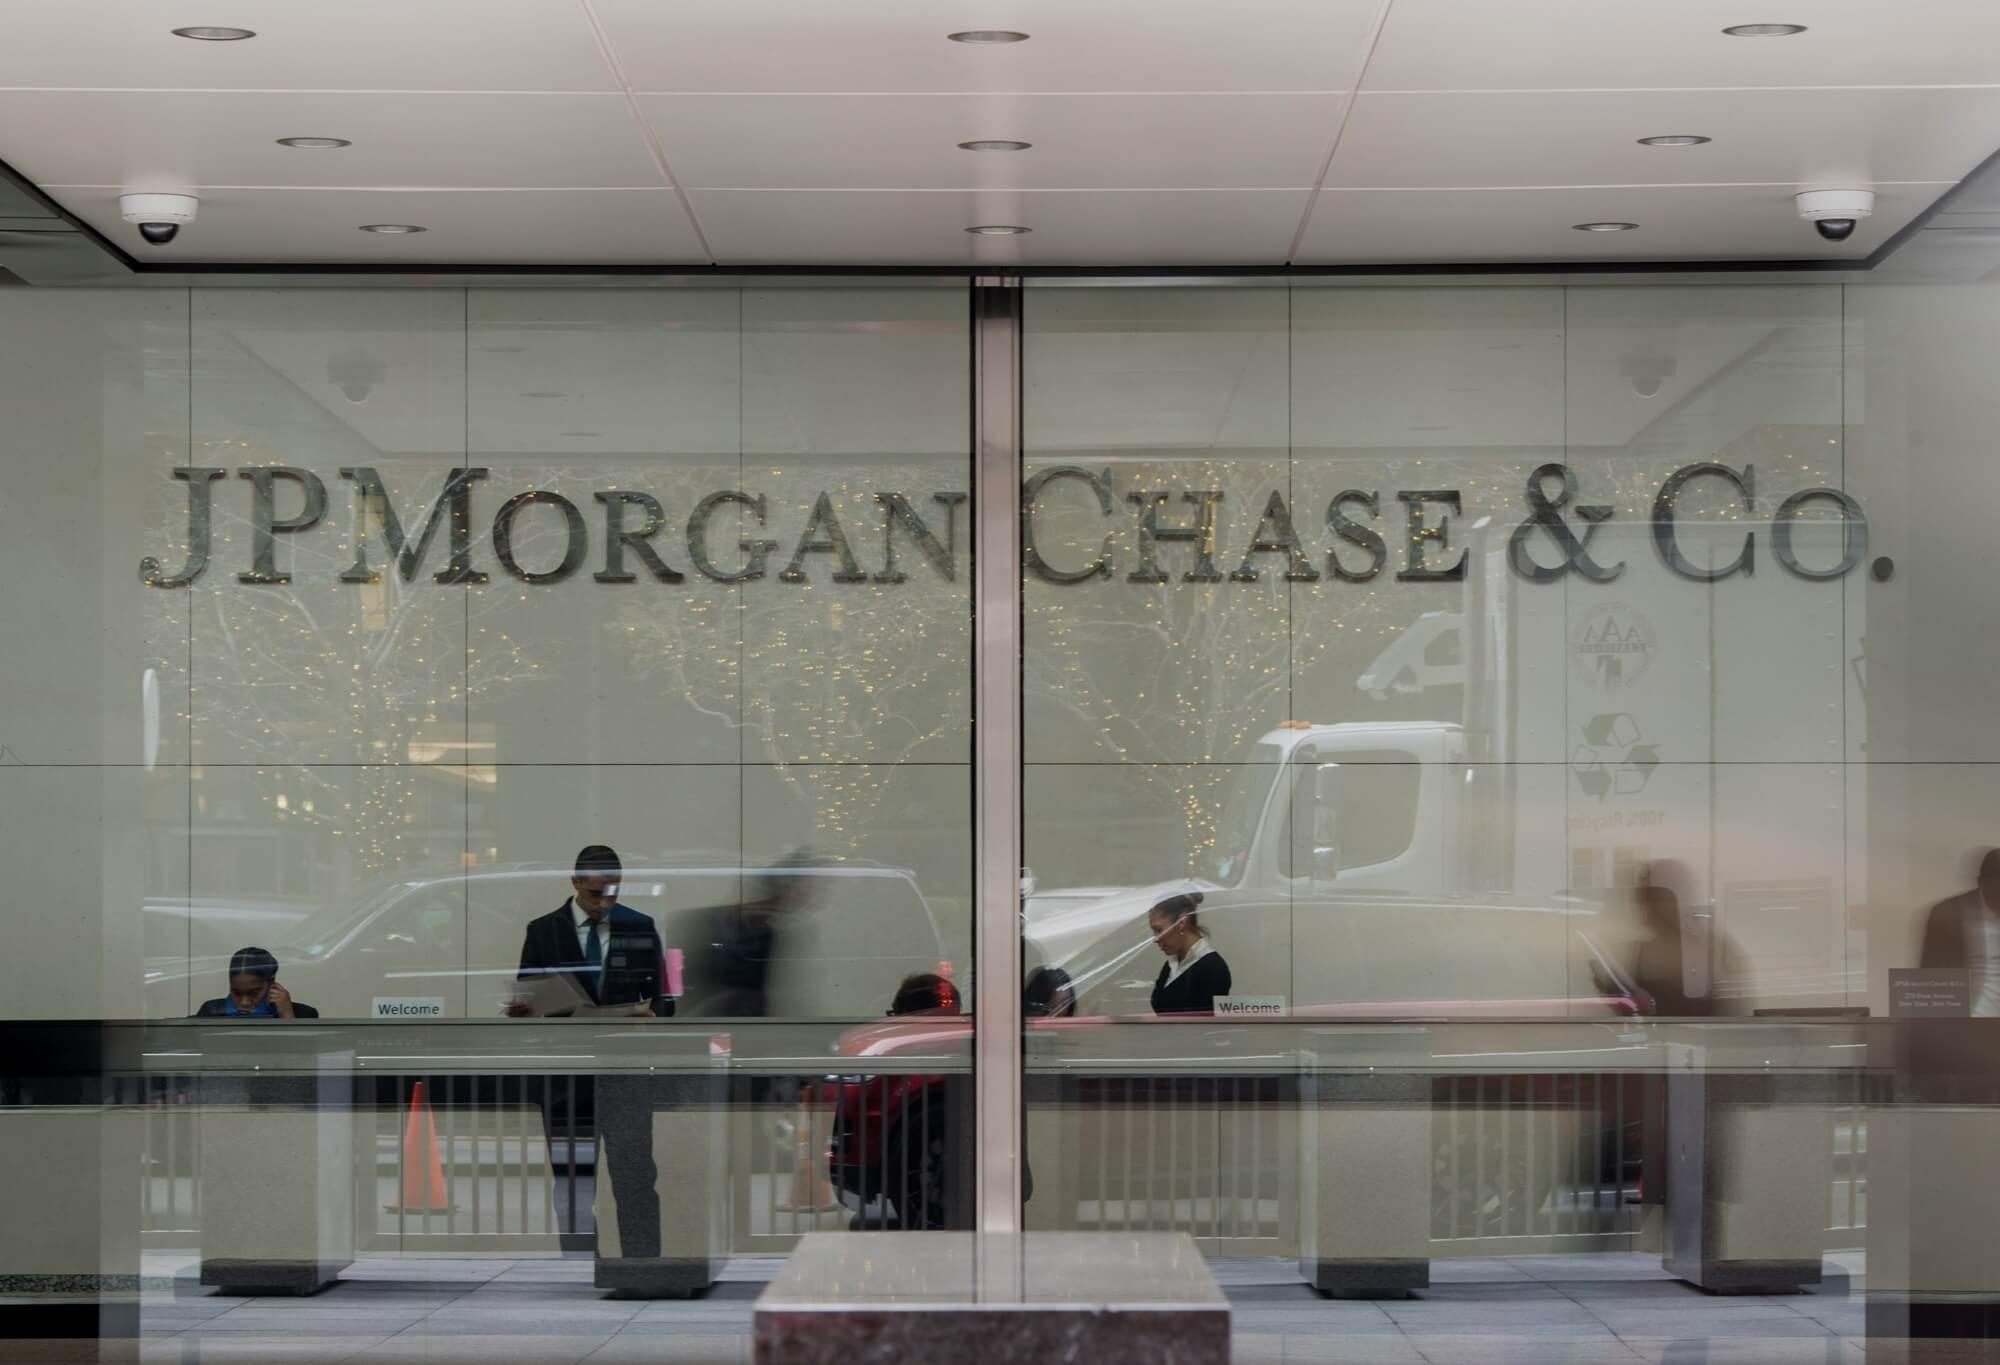 JPMorgan_Chase.jpg